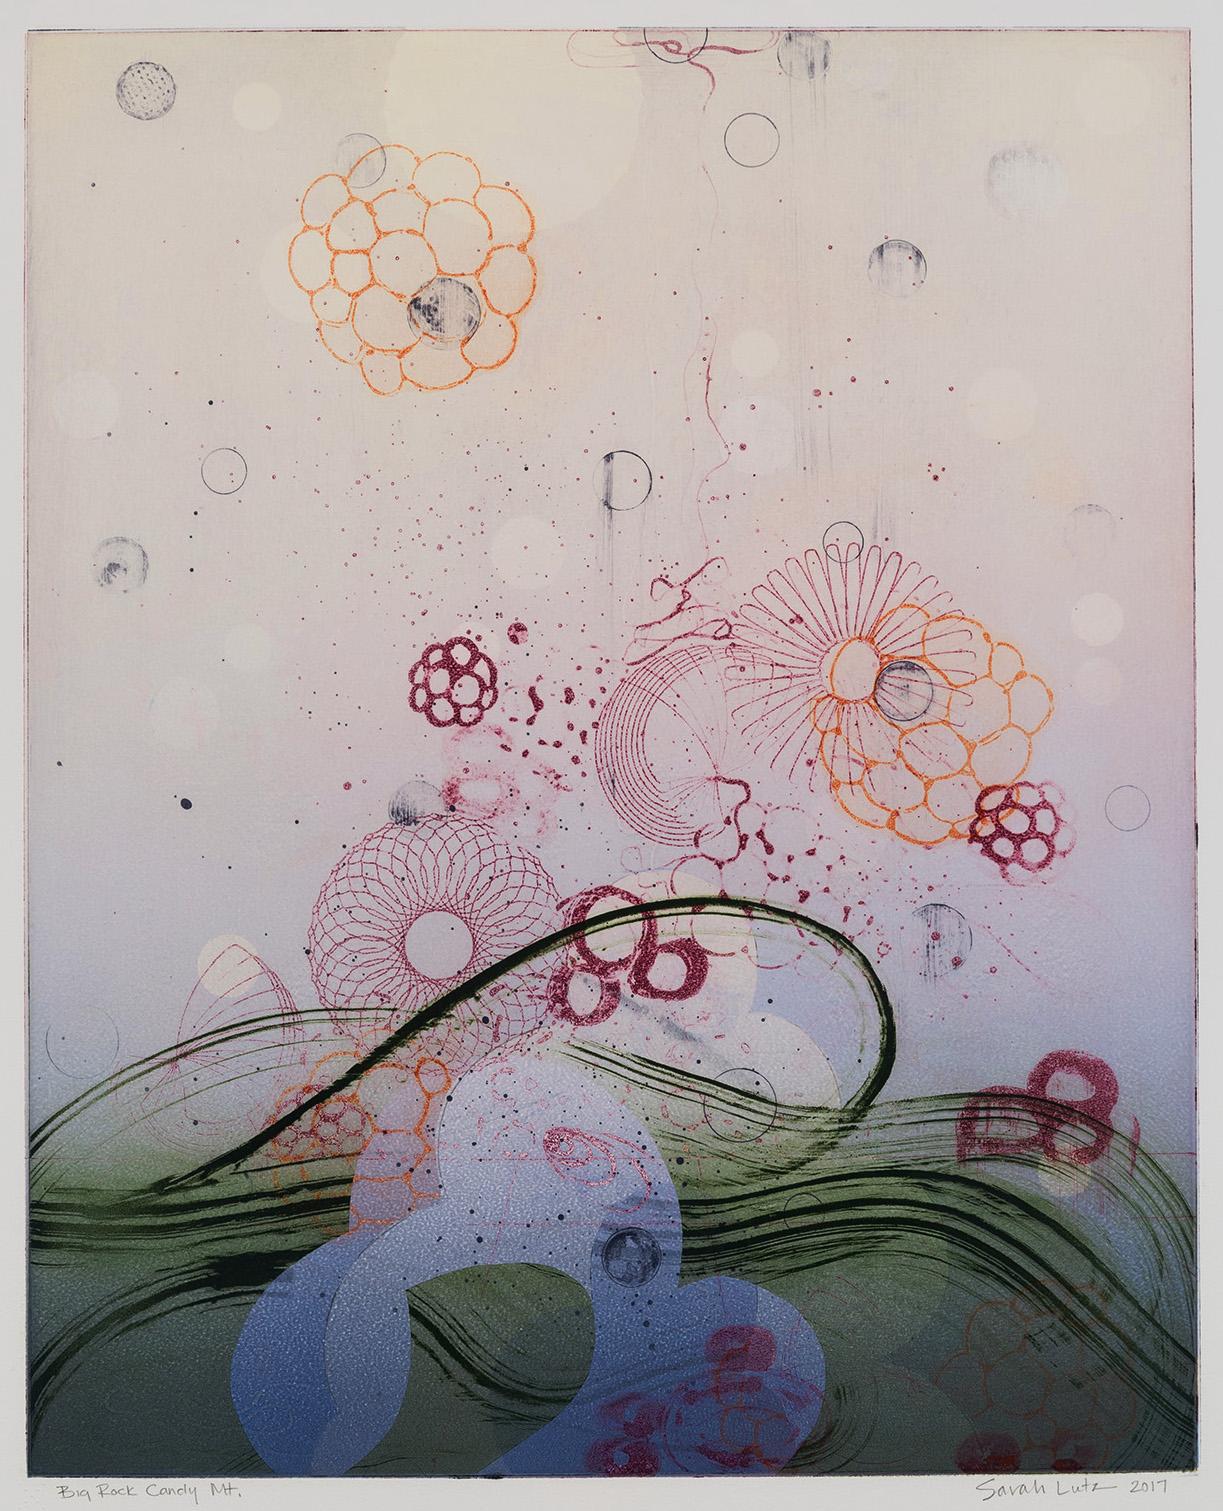 Sarah Lutz, Big Rock Candy Mountain (No. 11), 2017, monotype